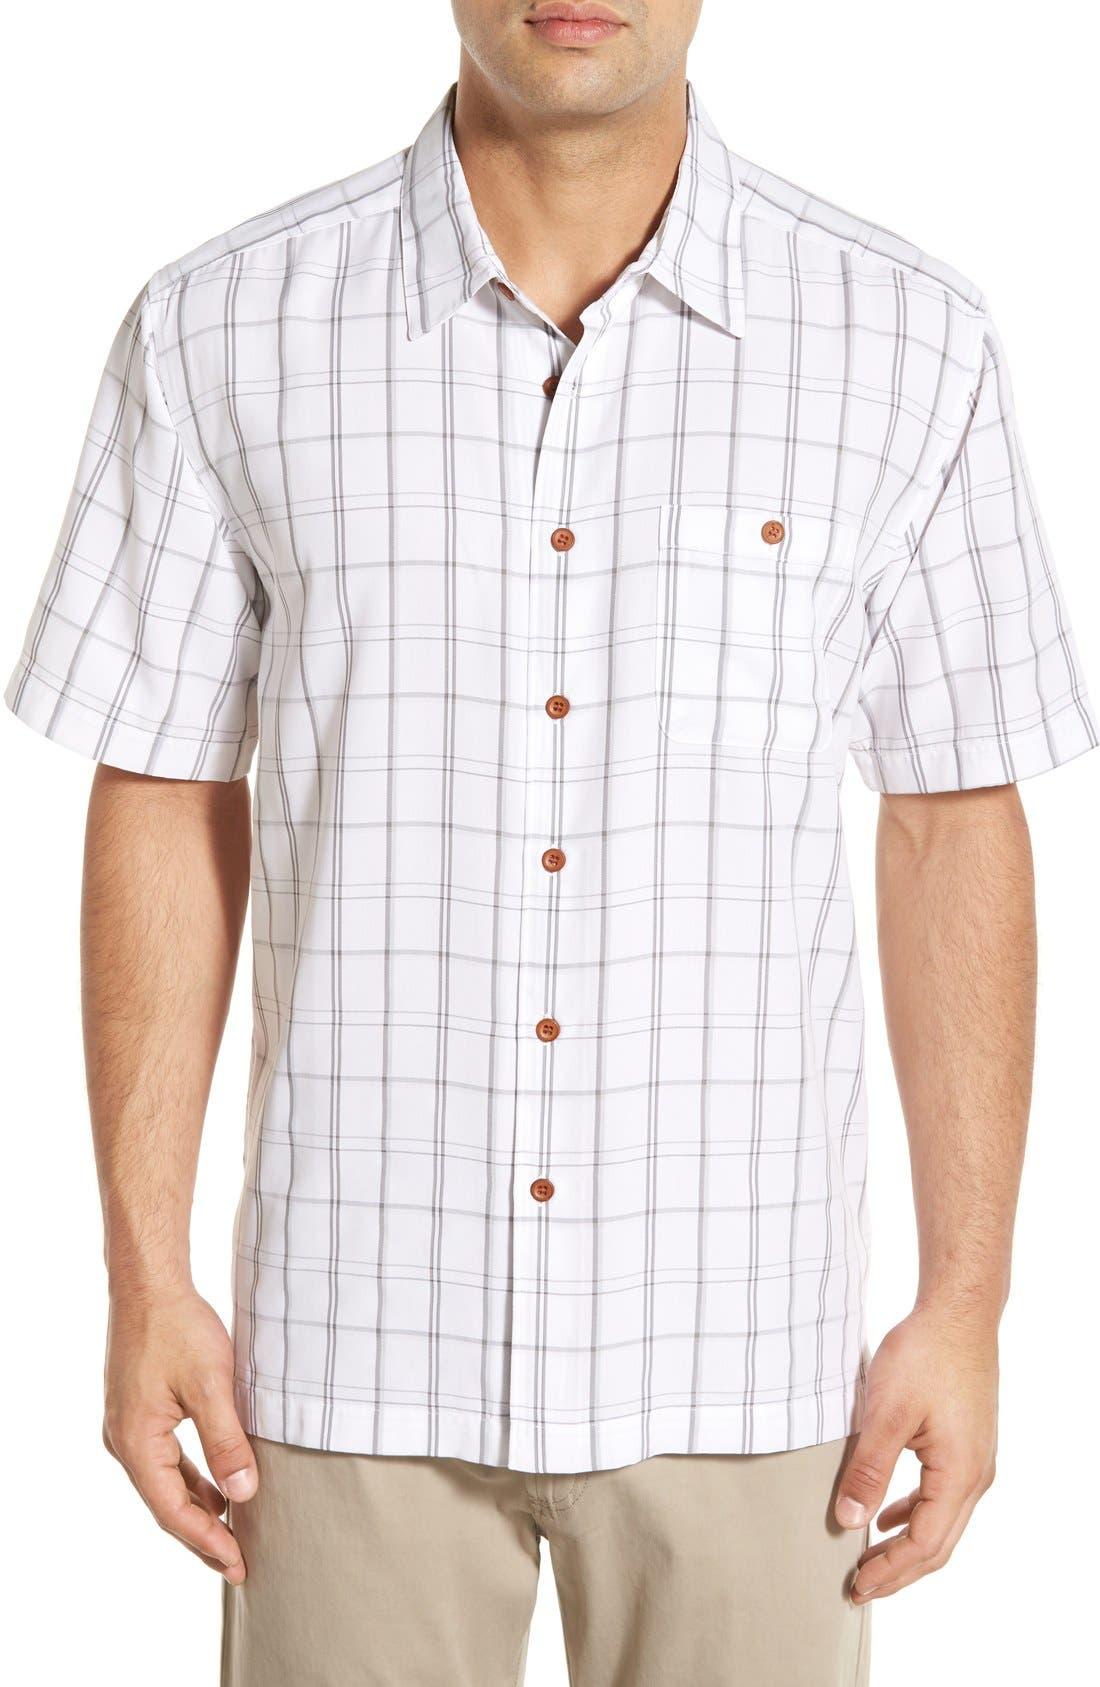 Quiksilver Waterman Collection 'Crow's Nest' Regular Fit Plaid Sport Shirt